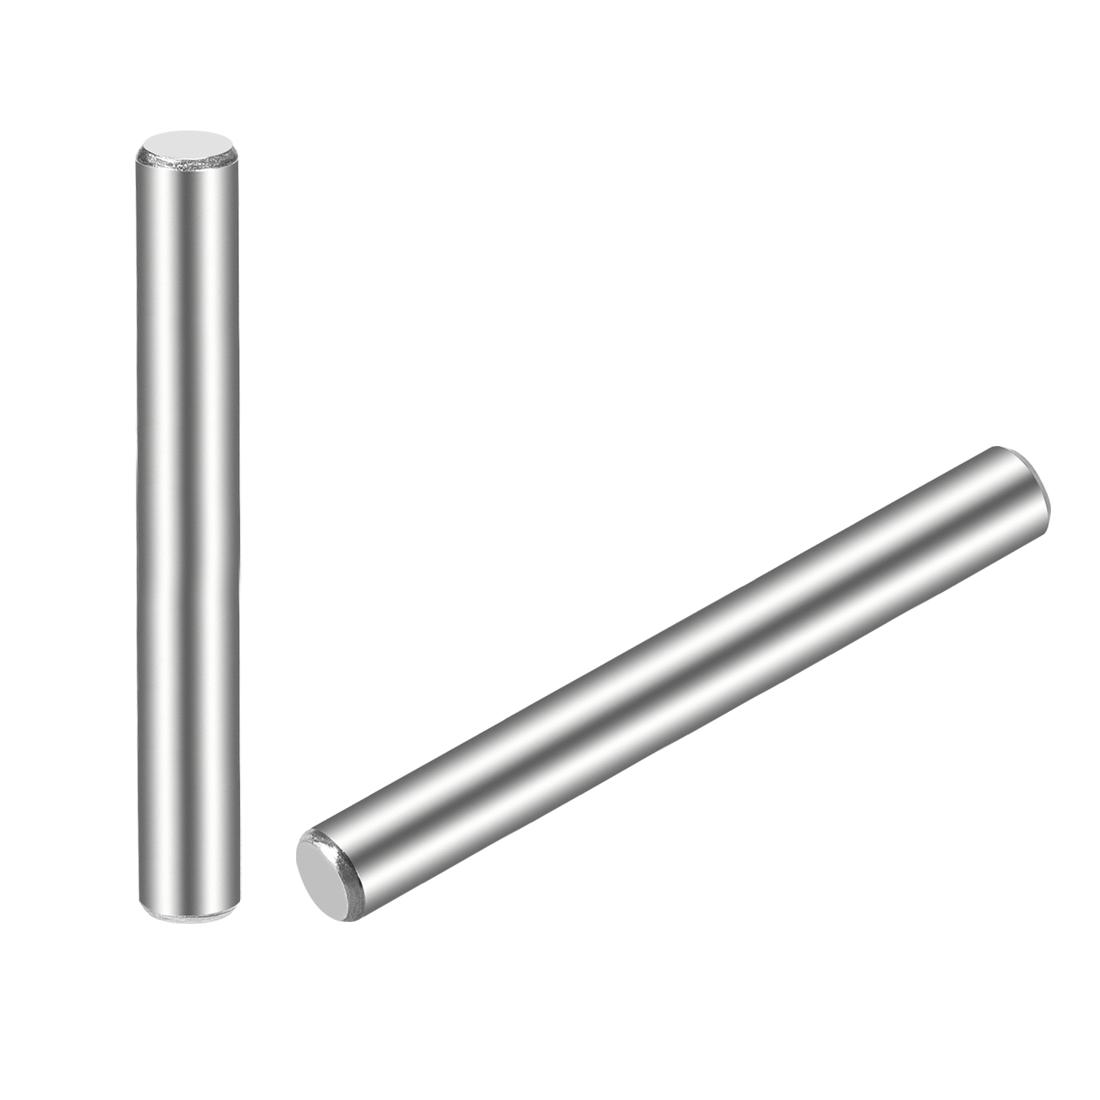 20Pcs 5mm x 70mm Dowel Pin 304 Stainless Steel Shelf Support Pin Fasten